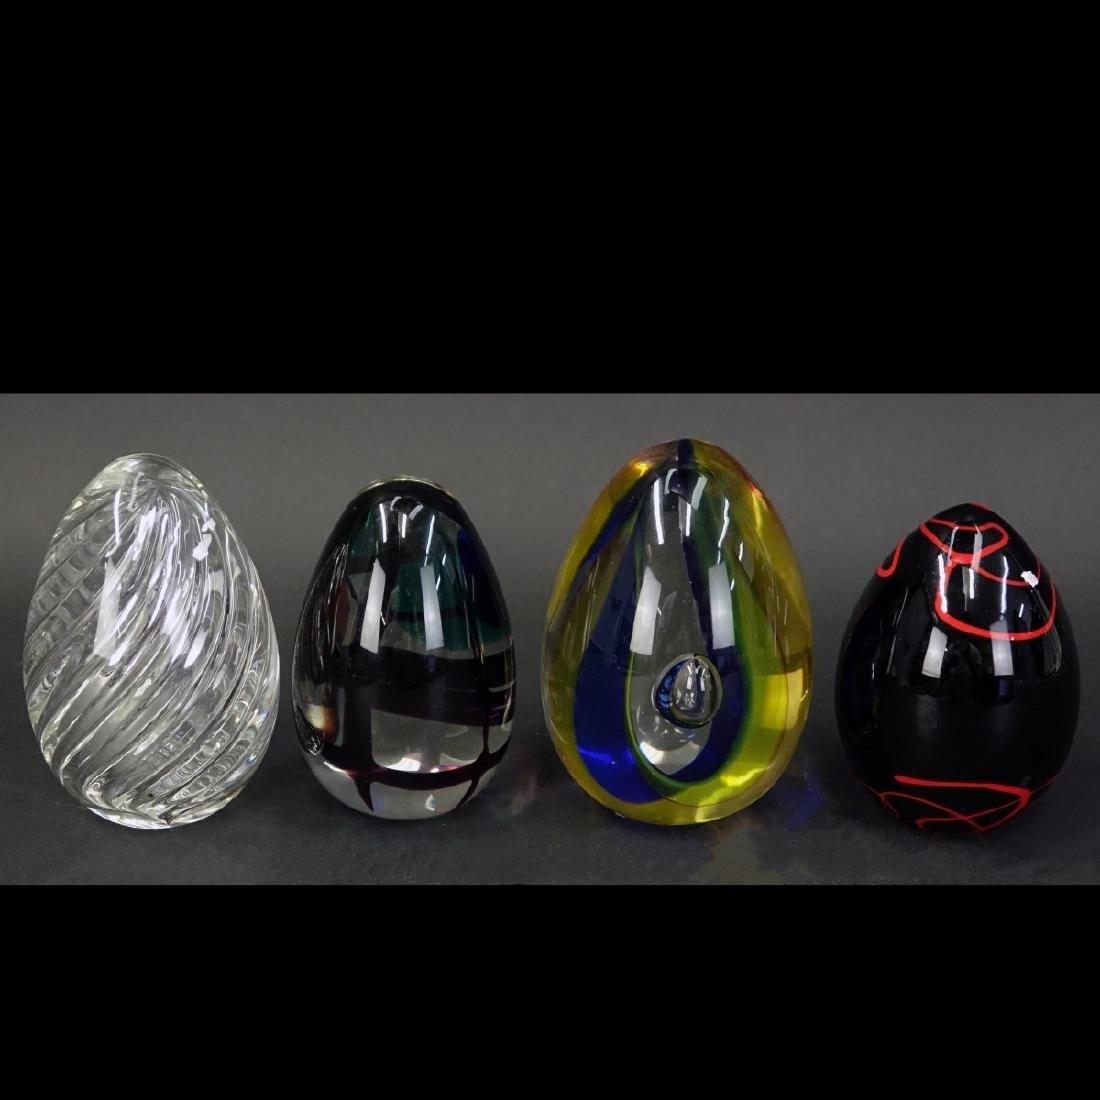 Four (4) Murano Seguso Art Glass Egg Paperweights